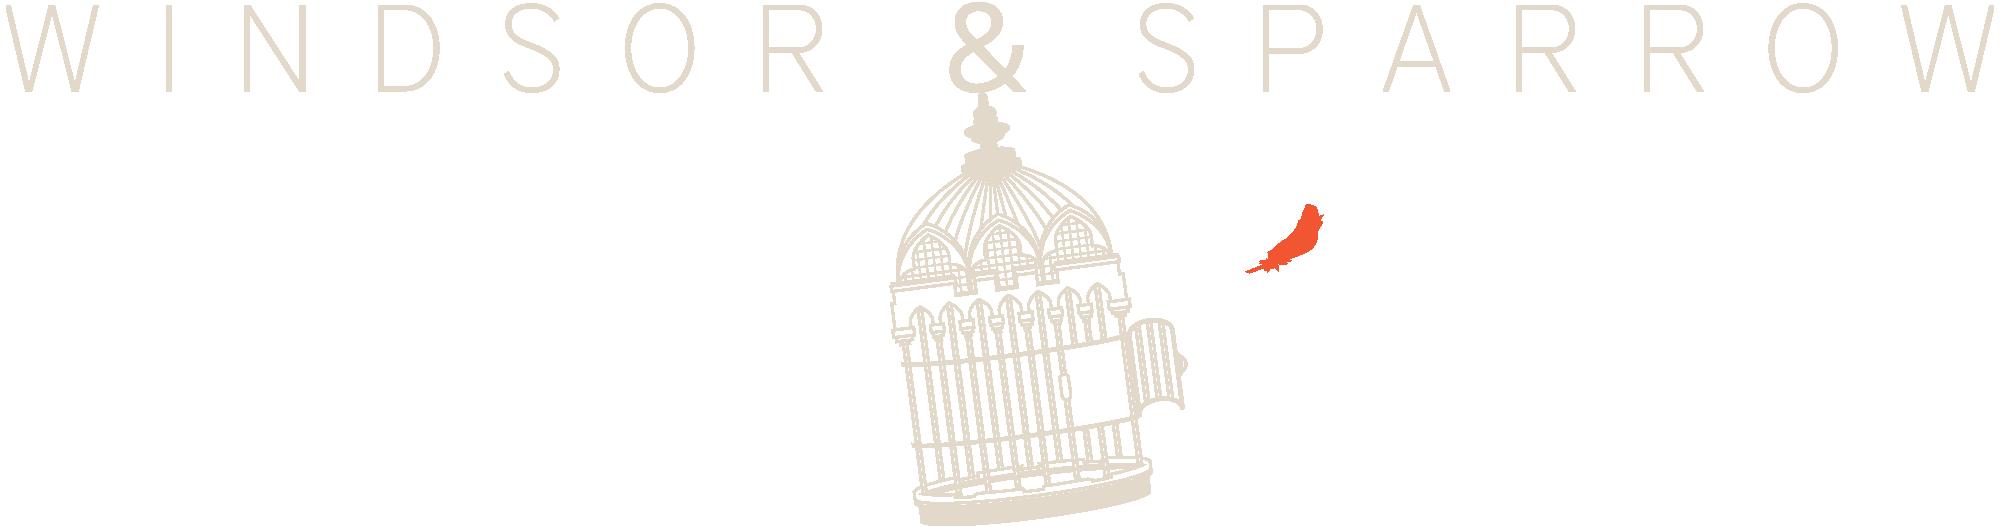 meng-he-windsor-and-sparrow-logo